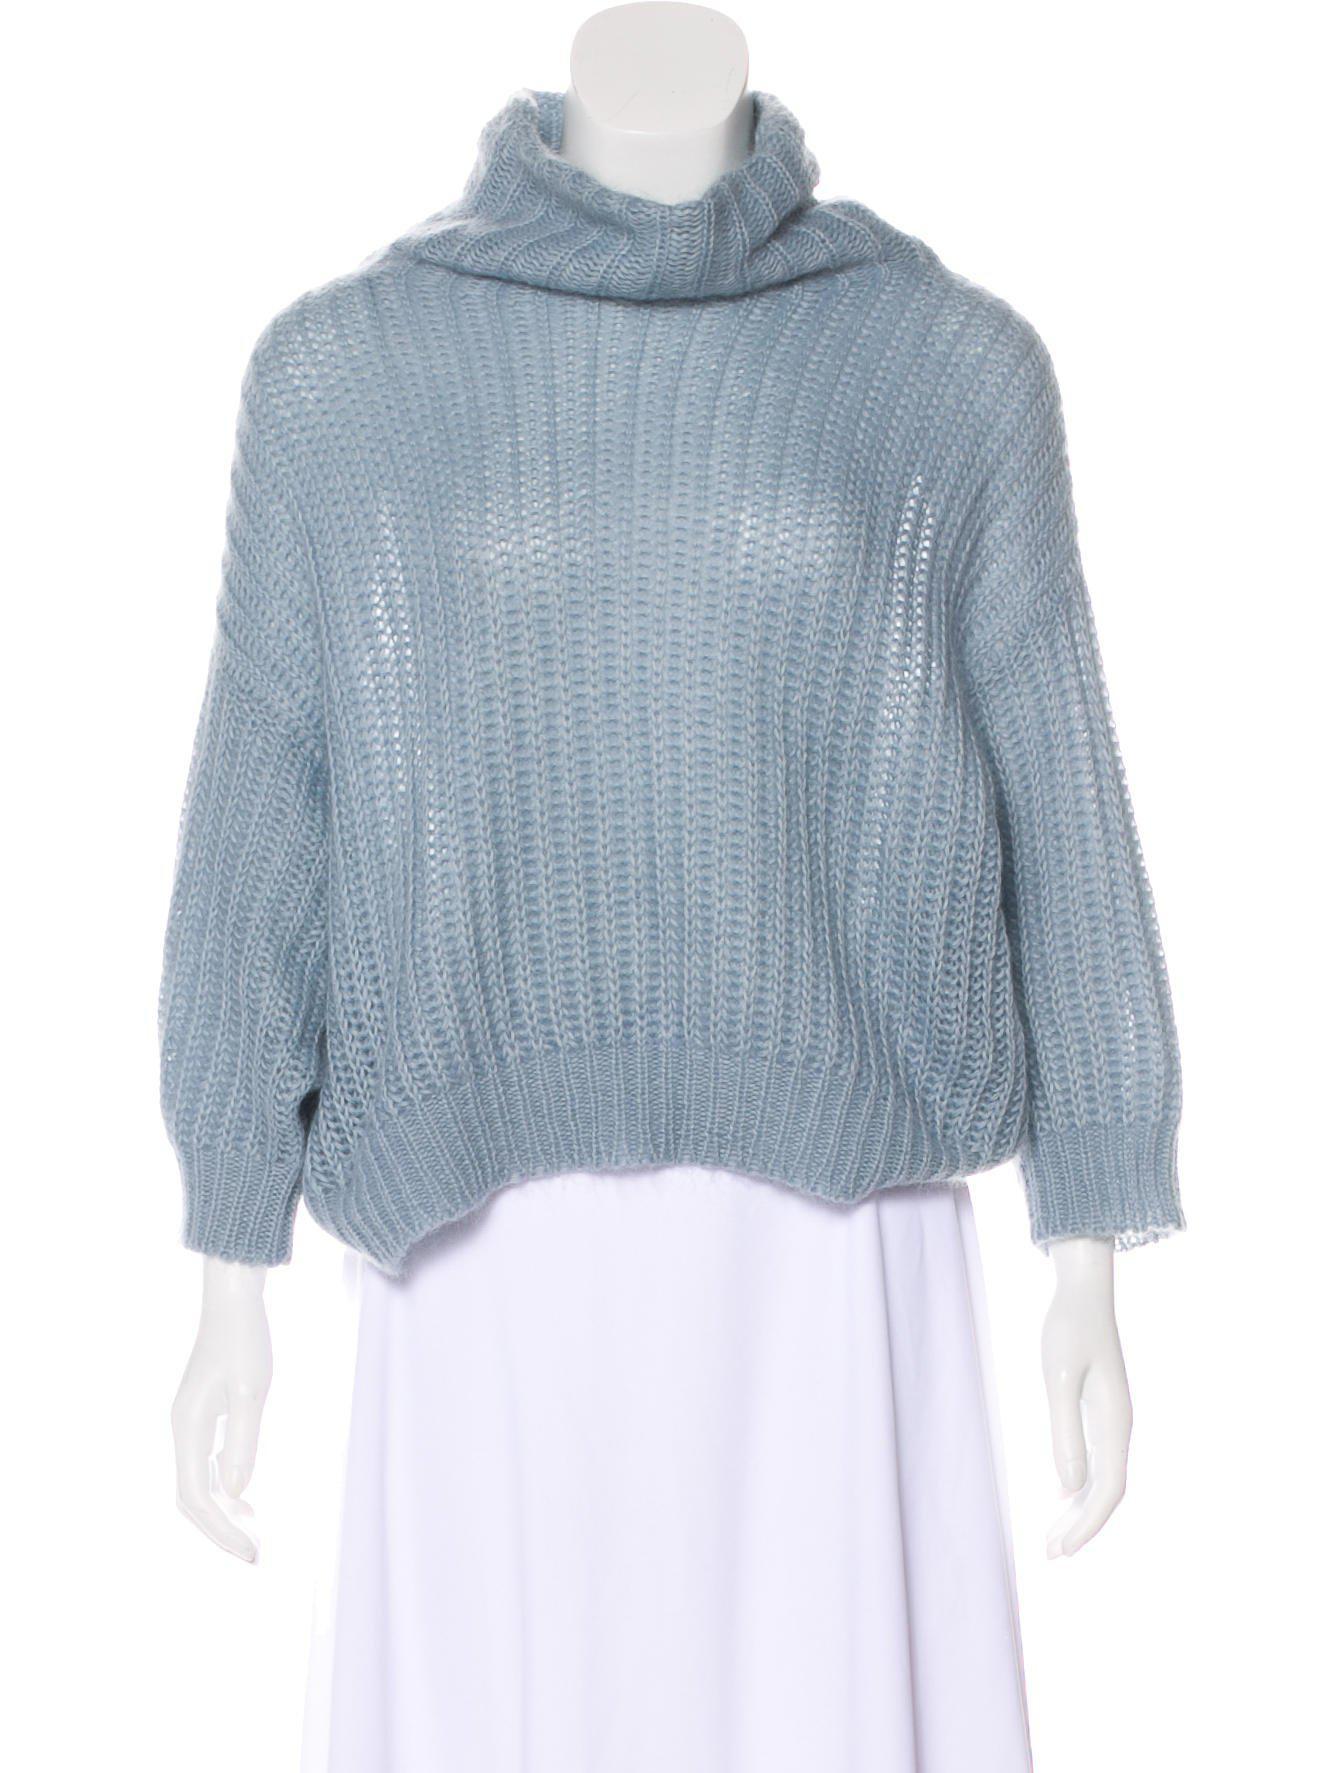 cefd8feedb Lyst - Brunello Cucinelli Mohair-blend Open Knit Sweater in Blue